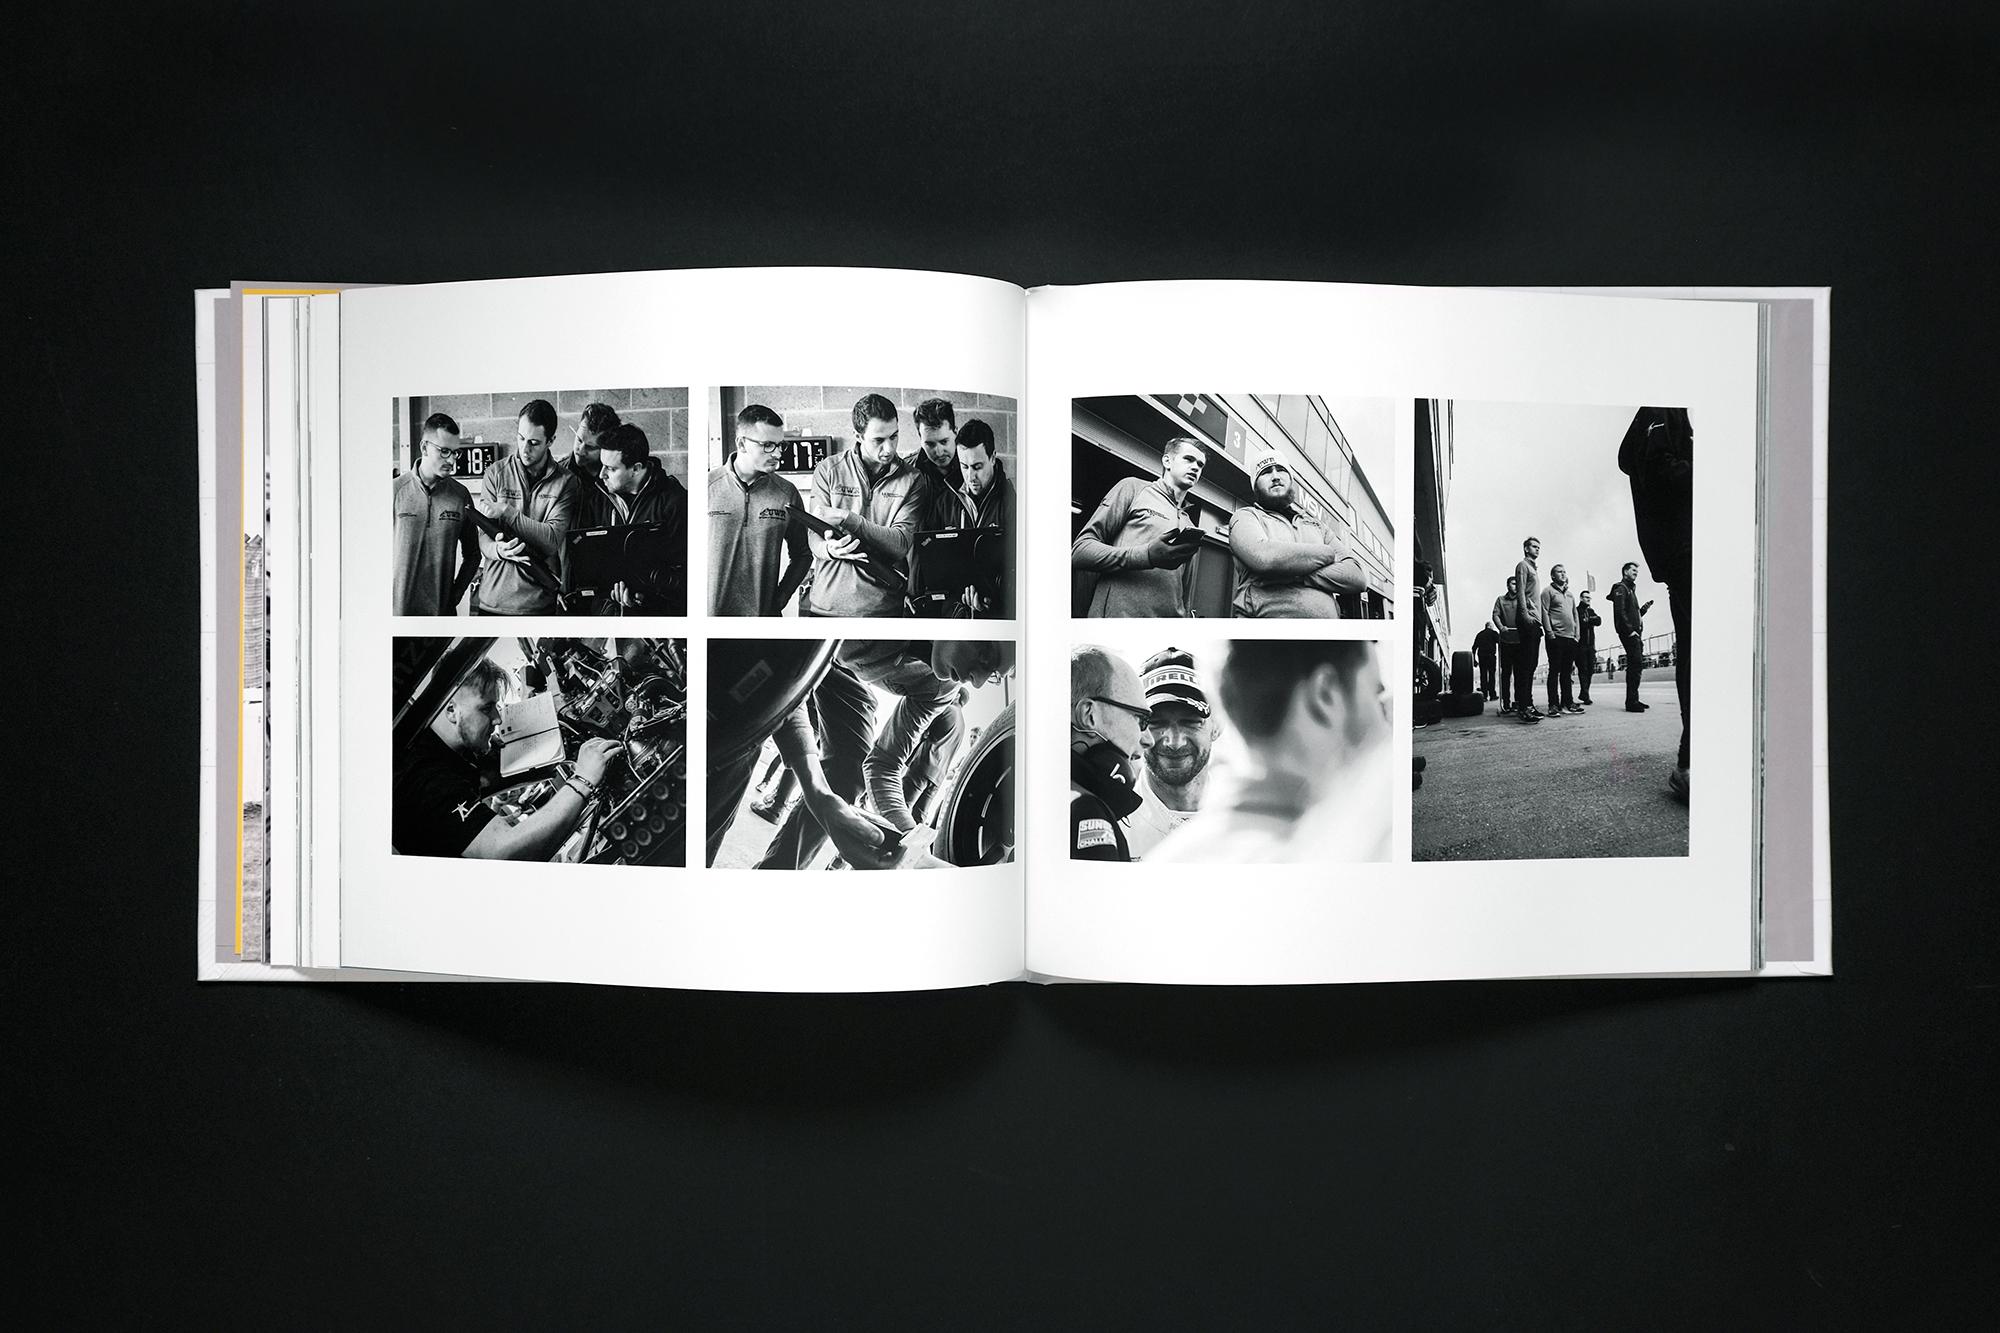 https://rusyndesign.co.uk/wp-content/uploads/2020/04/UWR-19-book-shots-14.jpg